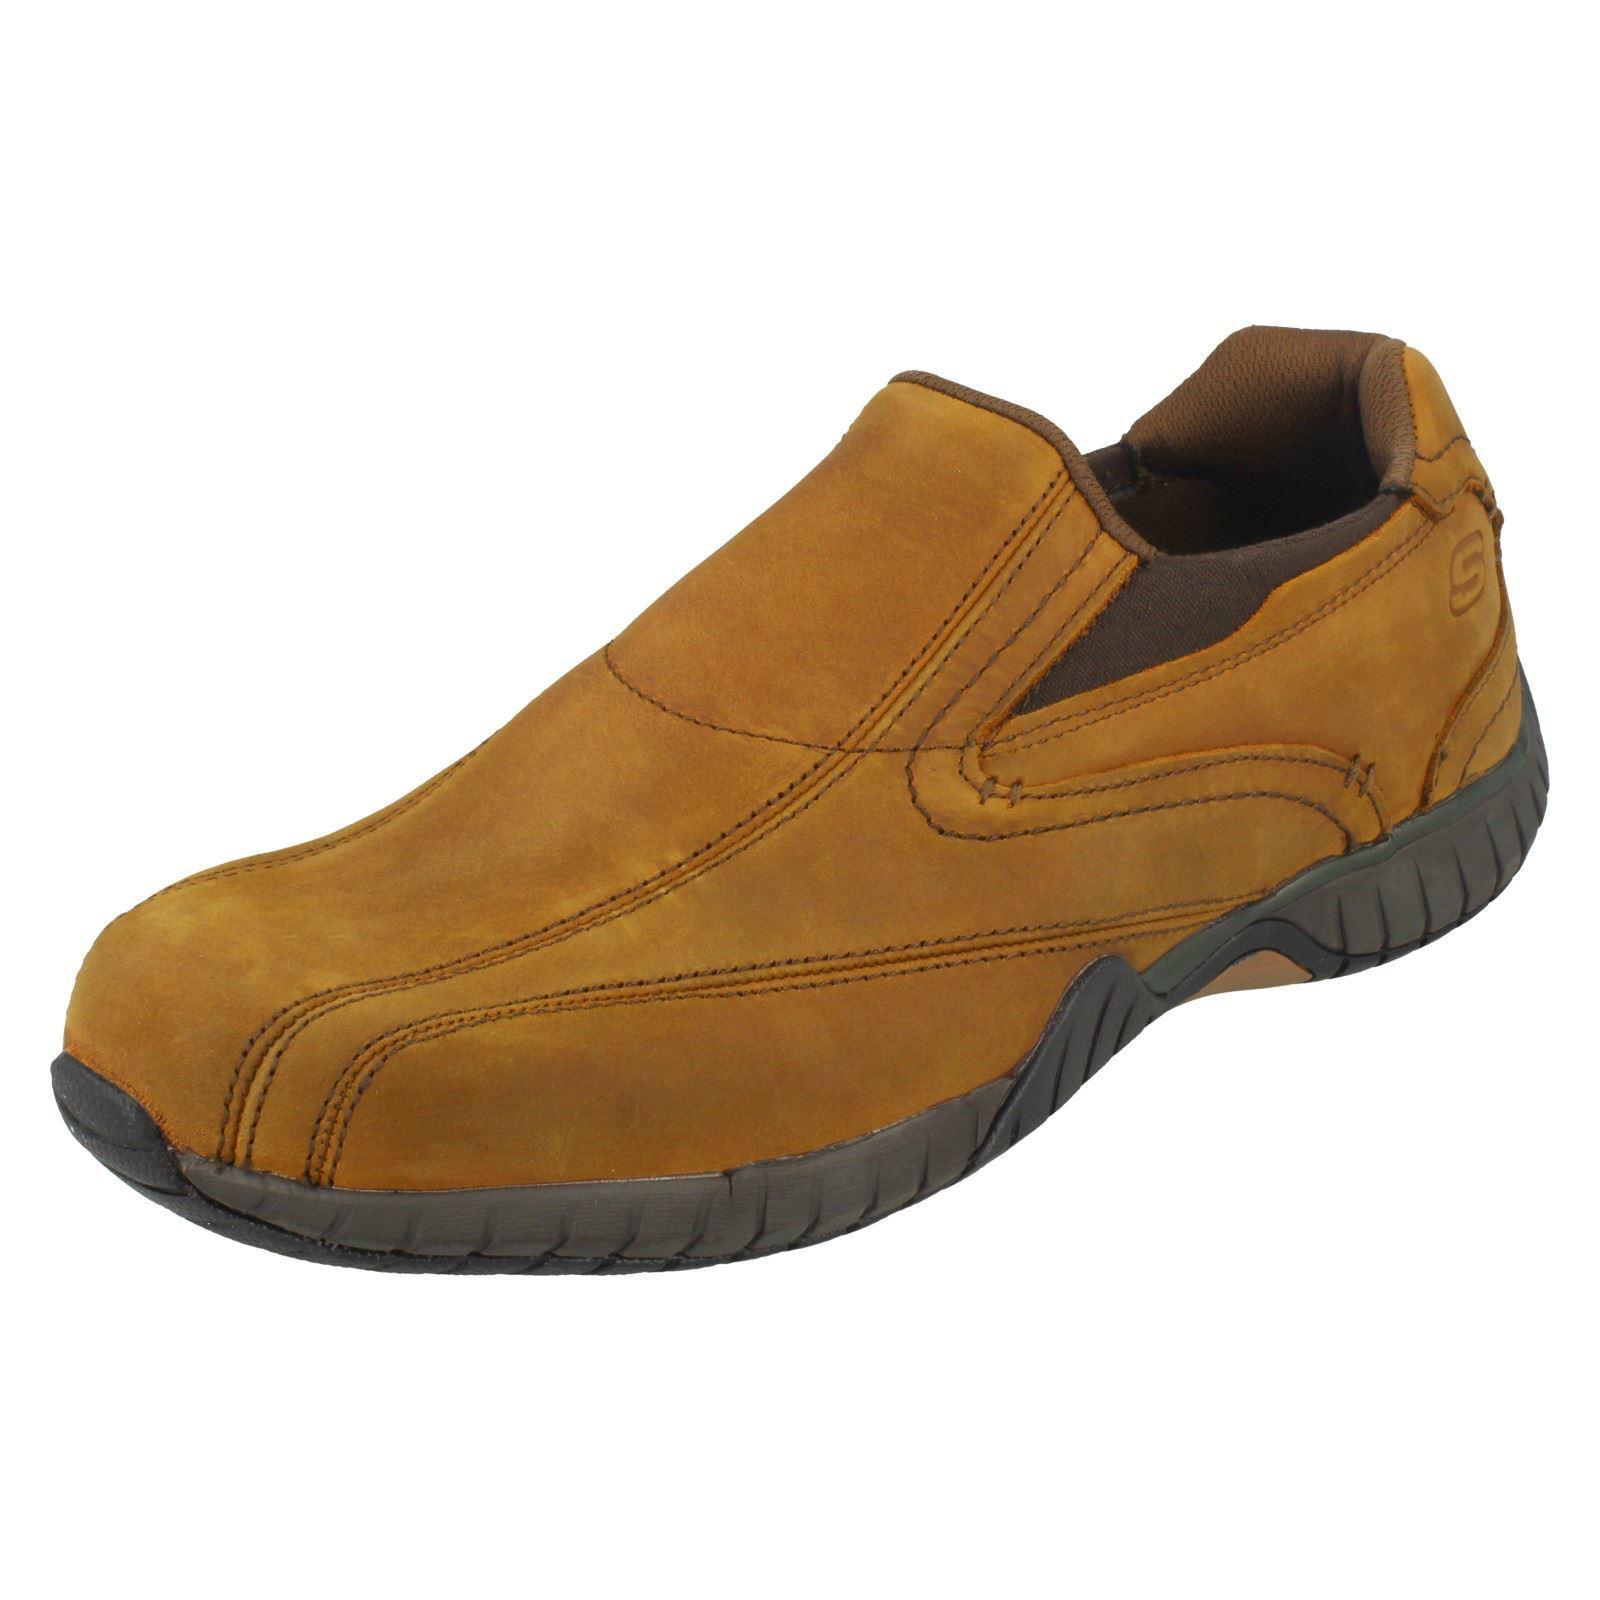 Skechers Uomo Casual scarpe sendro BASCOM 65287